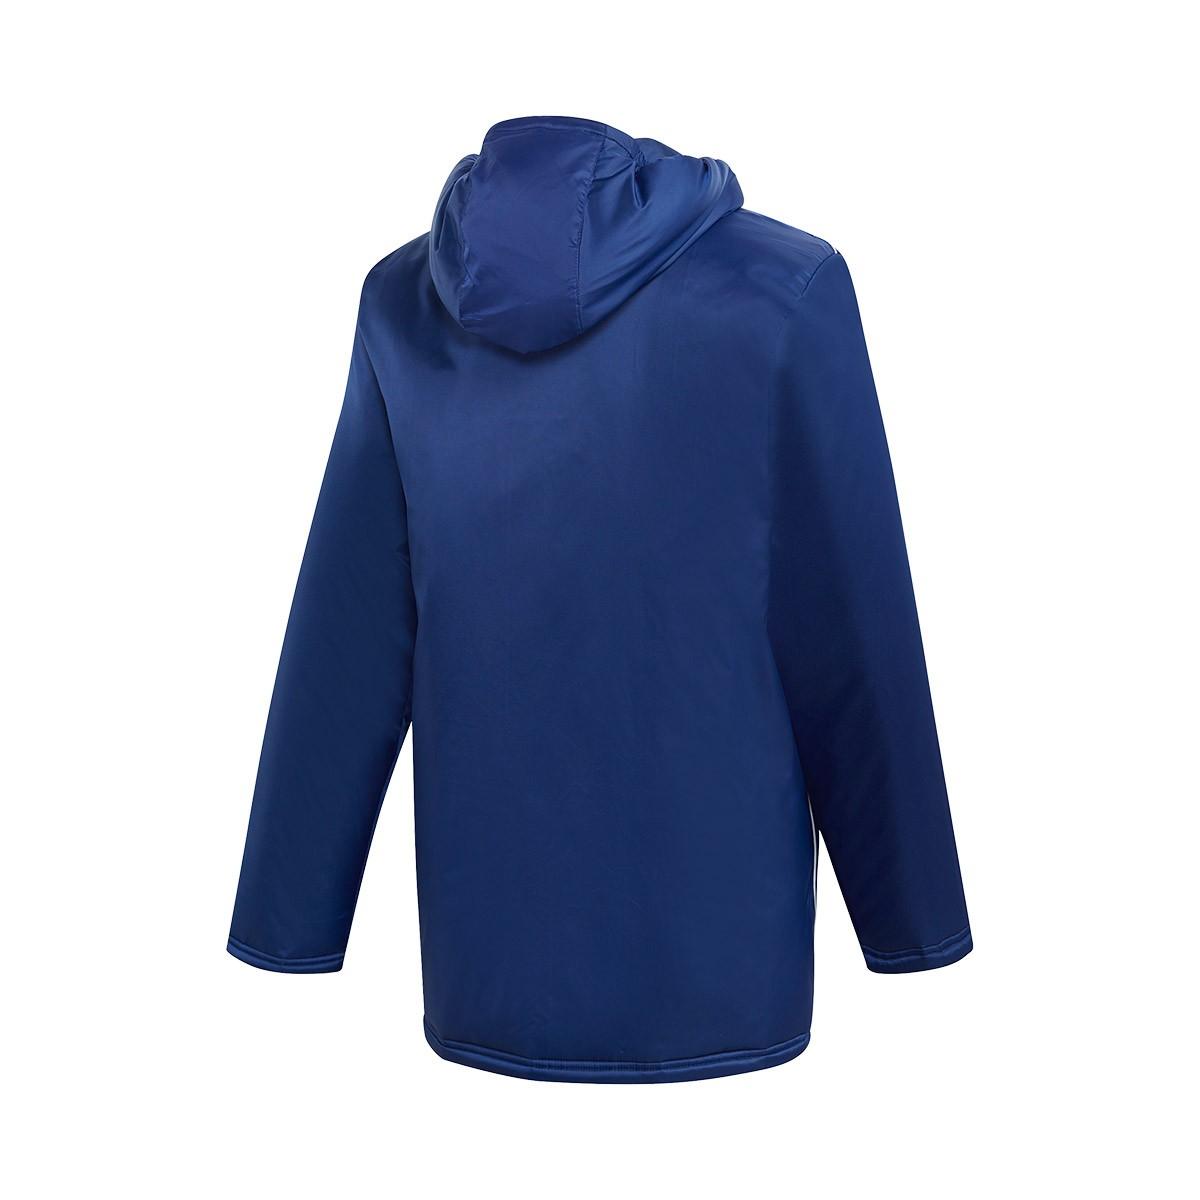 79ff8e17a Chaquetón adidas Core 18 Stadium Niño Dark blue-White - Tienda de fútbol  Fútbol Emotion